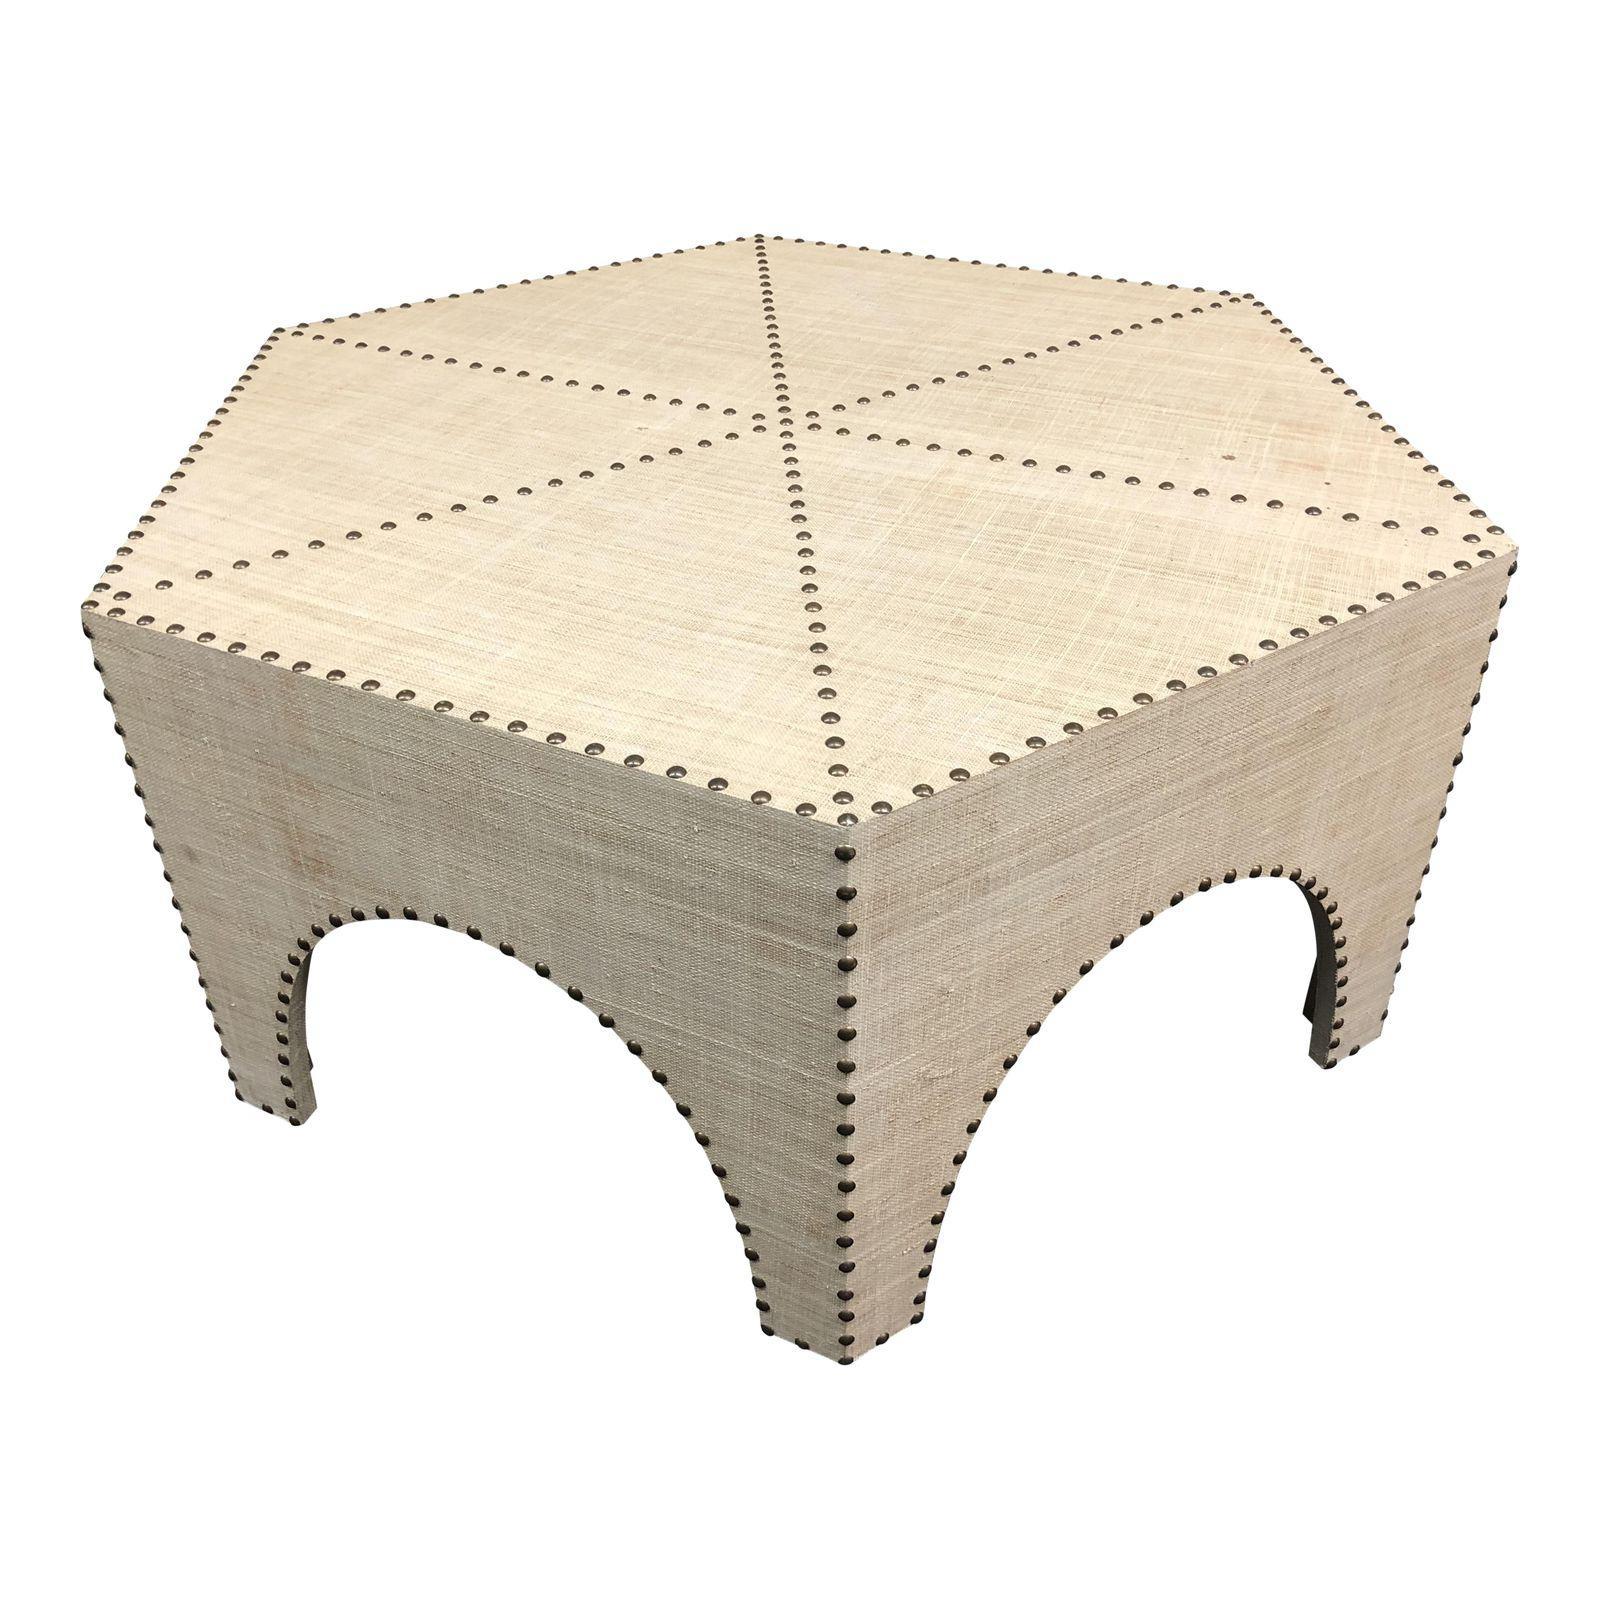 Recent Casablanca Coffee Tables With Regard To New Palecek Casablanca Raffia Coffee Table – Design Plus Gallery (View 18 of 20)